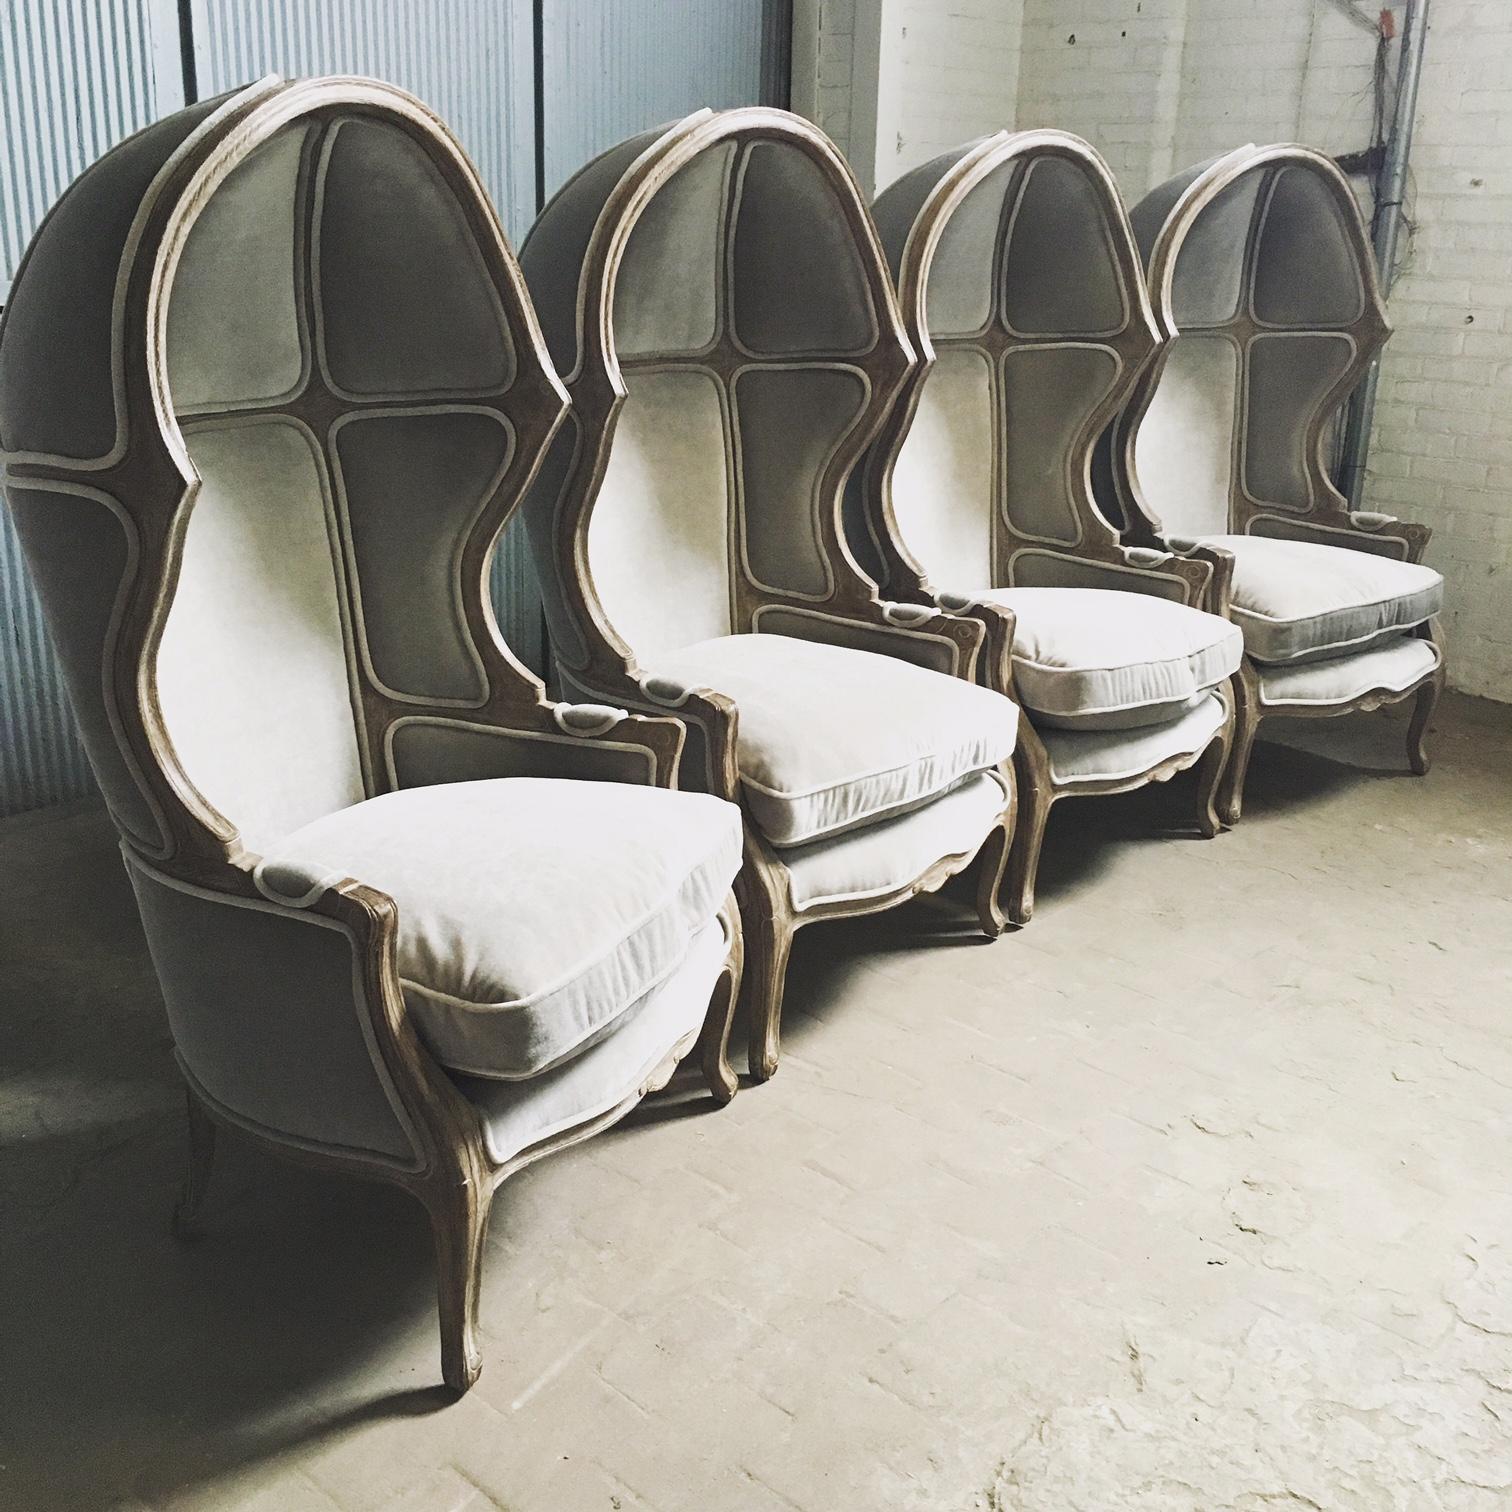 Recovered Interior Restoration Hardare Versallies Chair